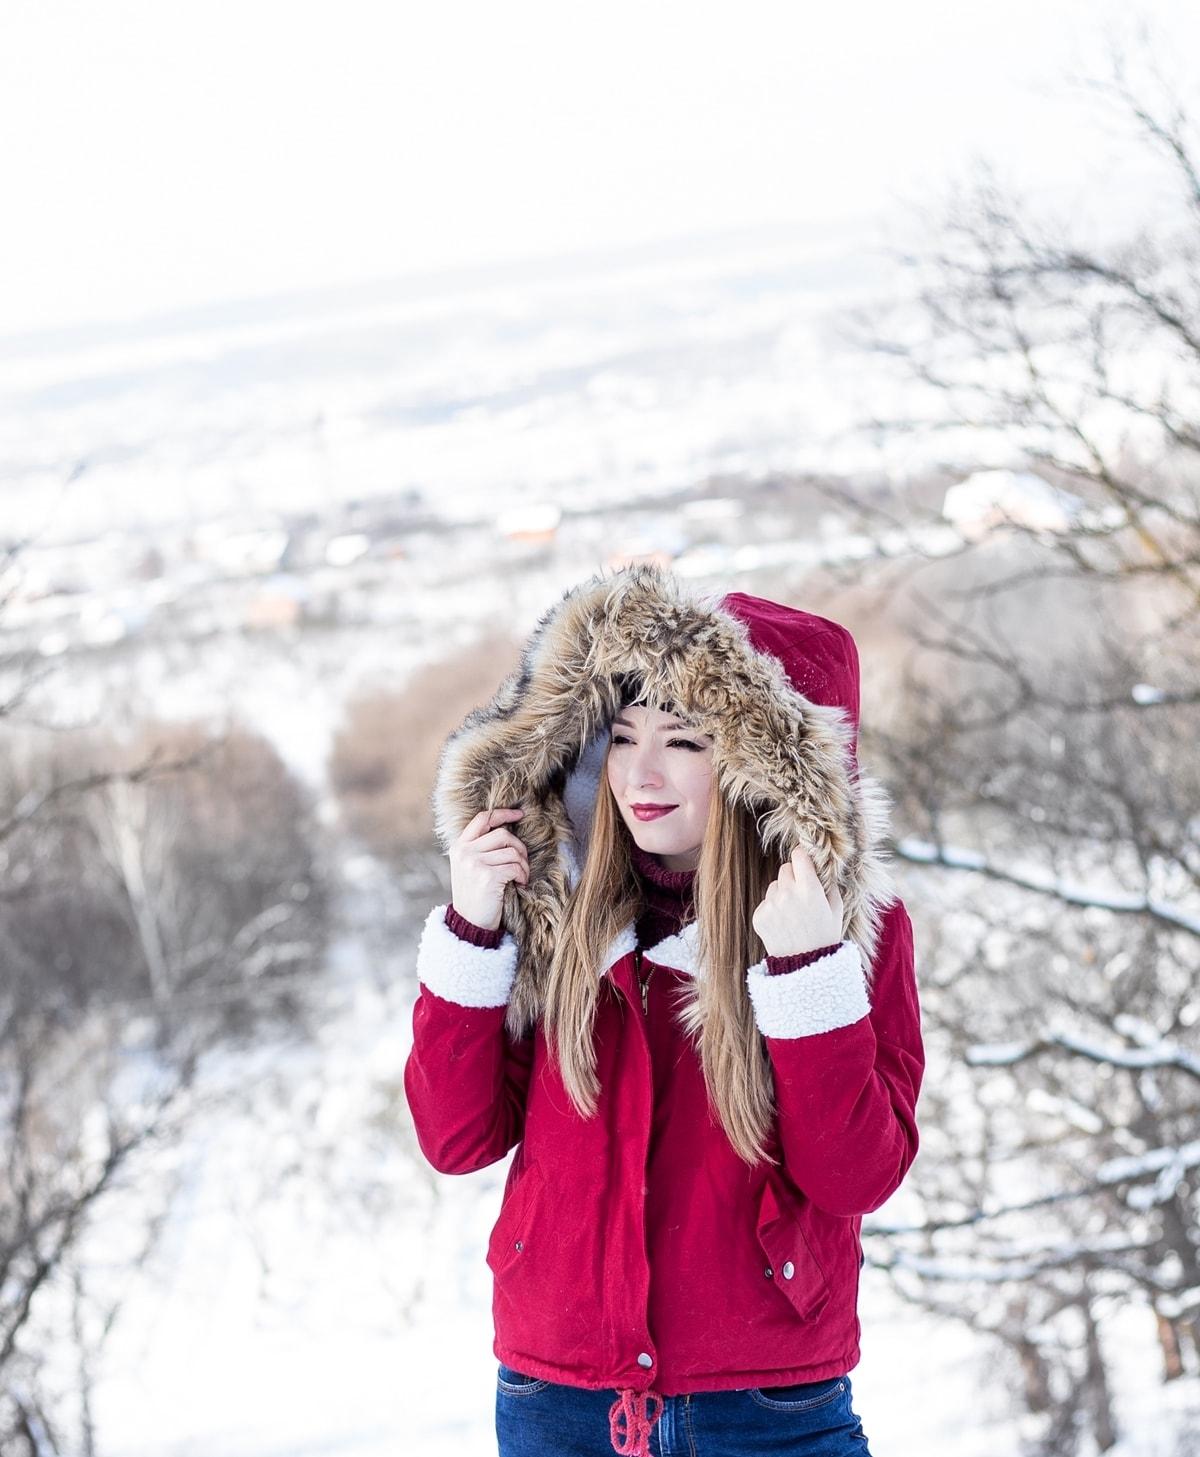 Andreea Ristea, geaca rosie de iarna cu gluga puf